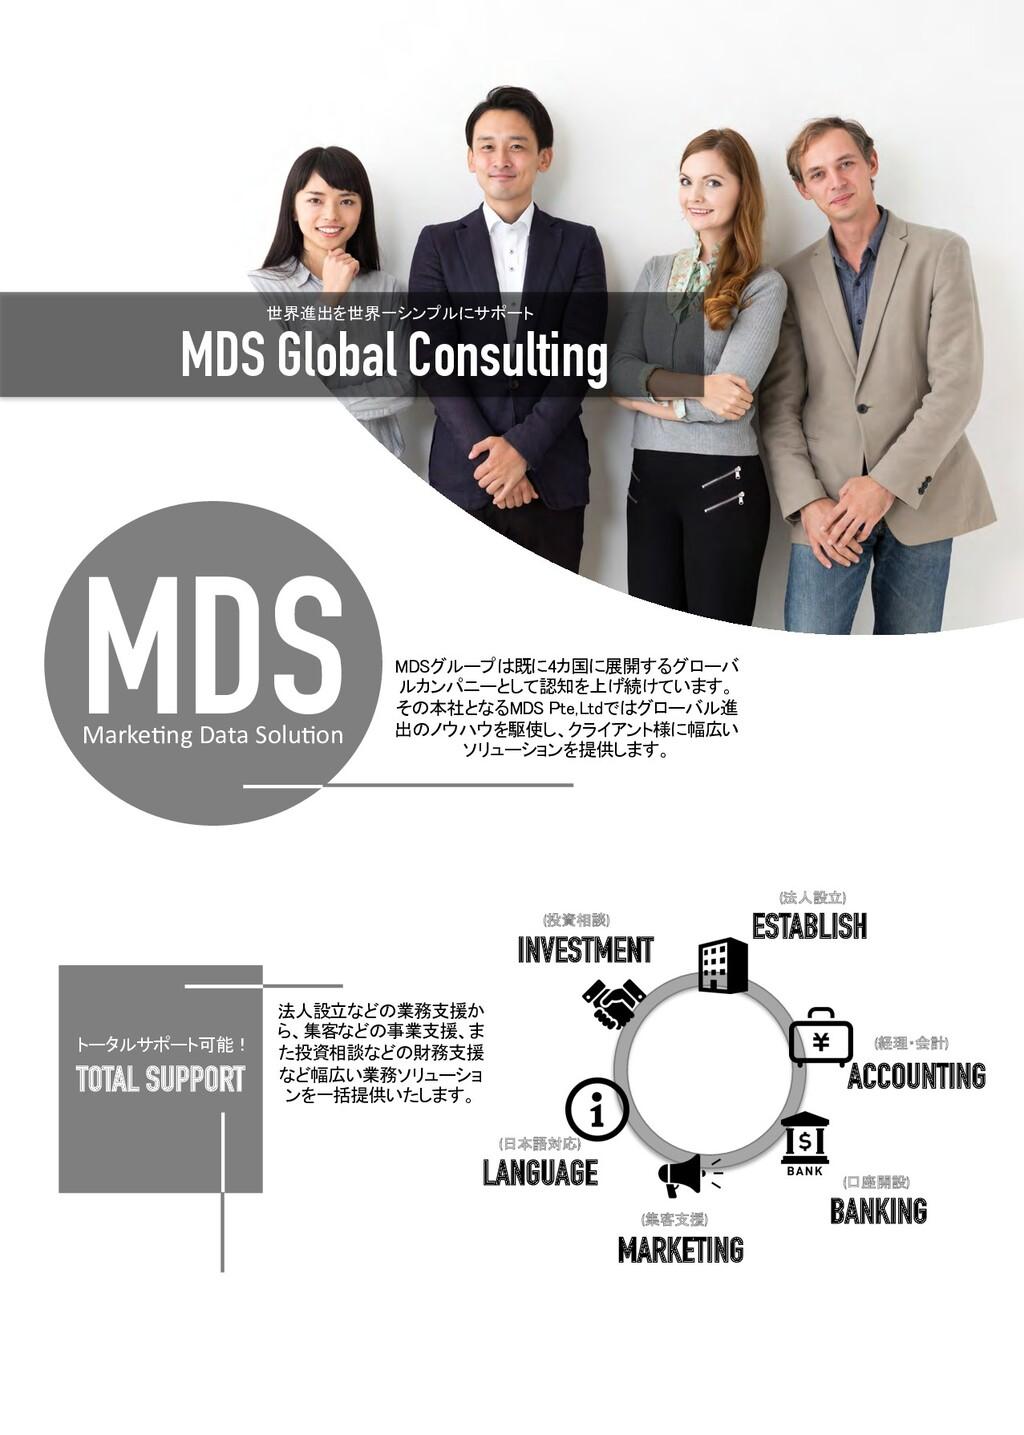 MDS Global Consulting 世界進出を世界一シンプルにサポート Marke7n...